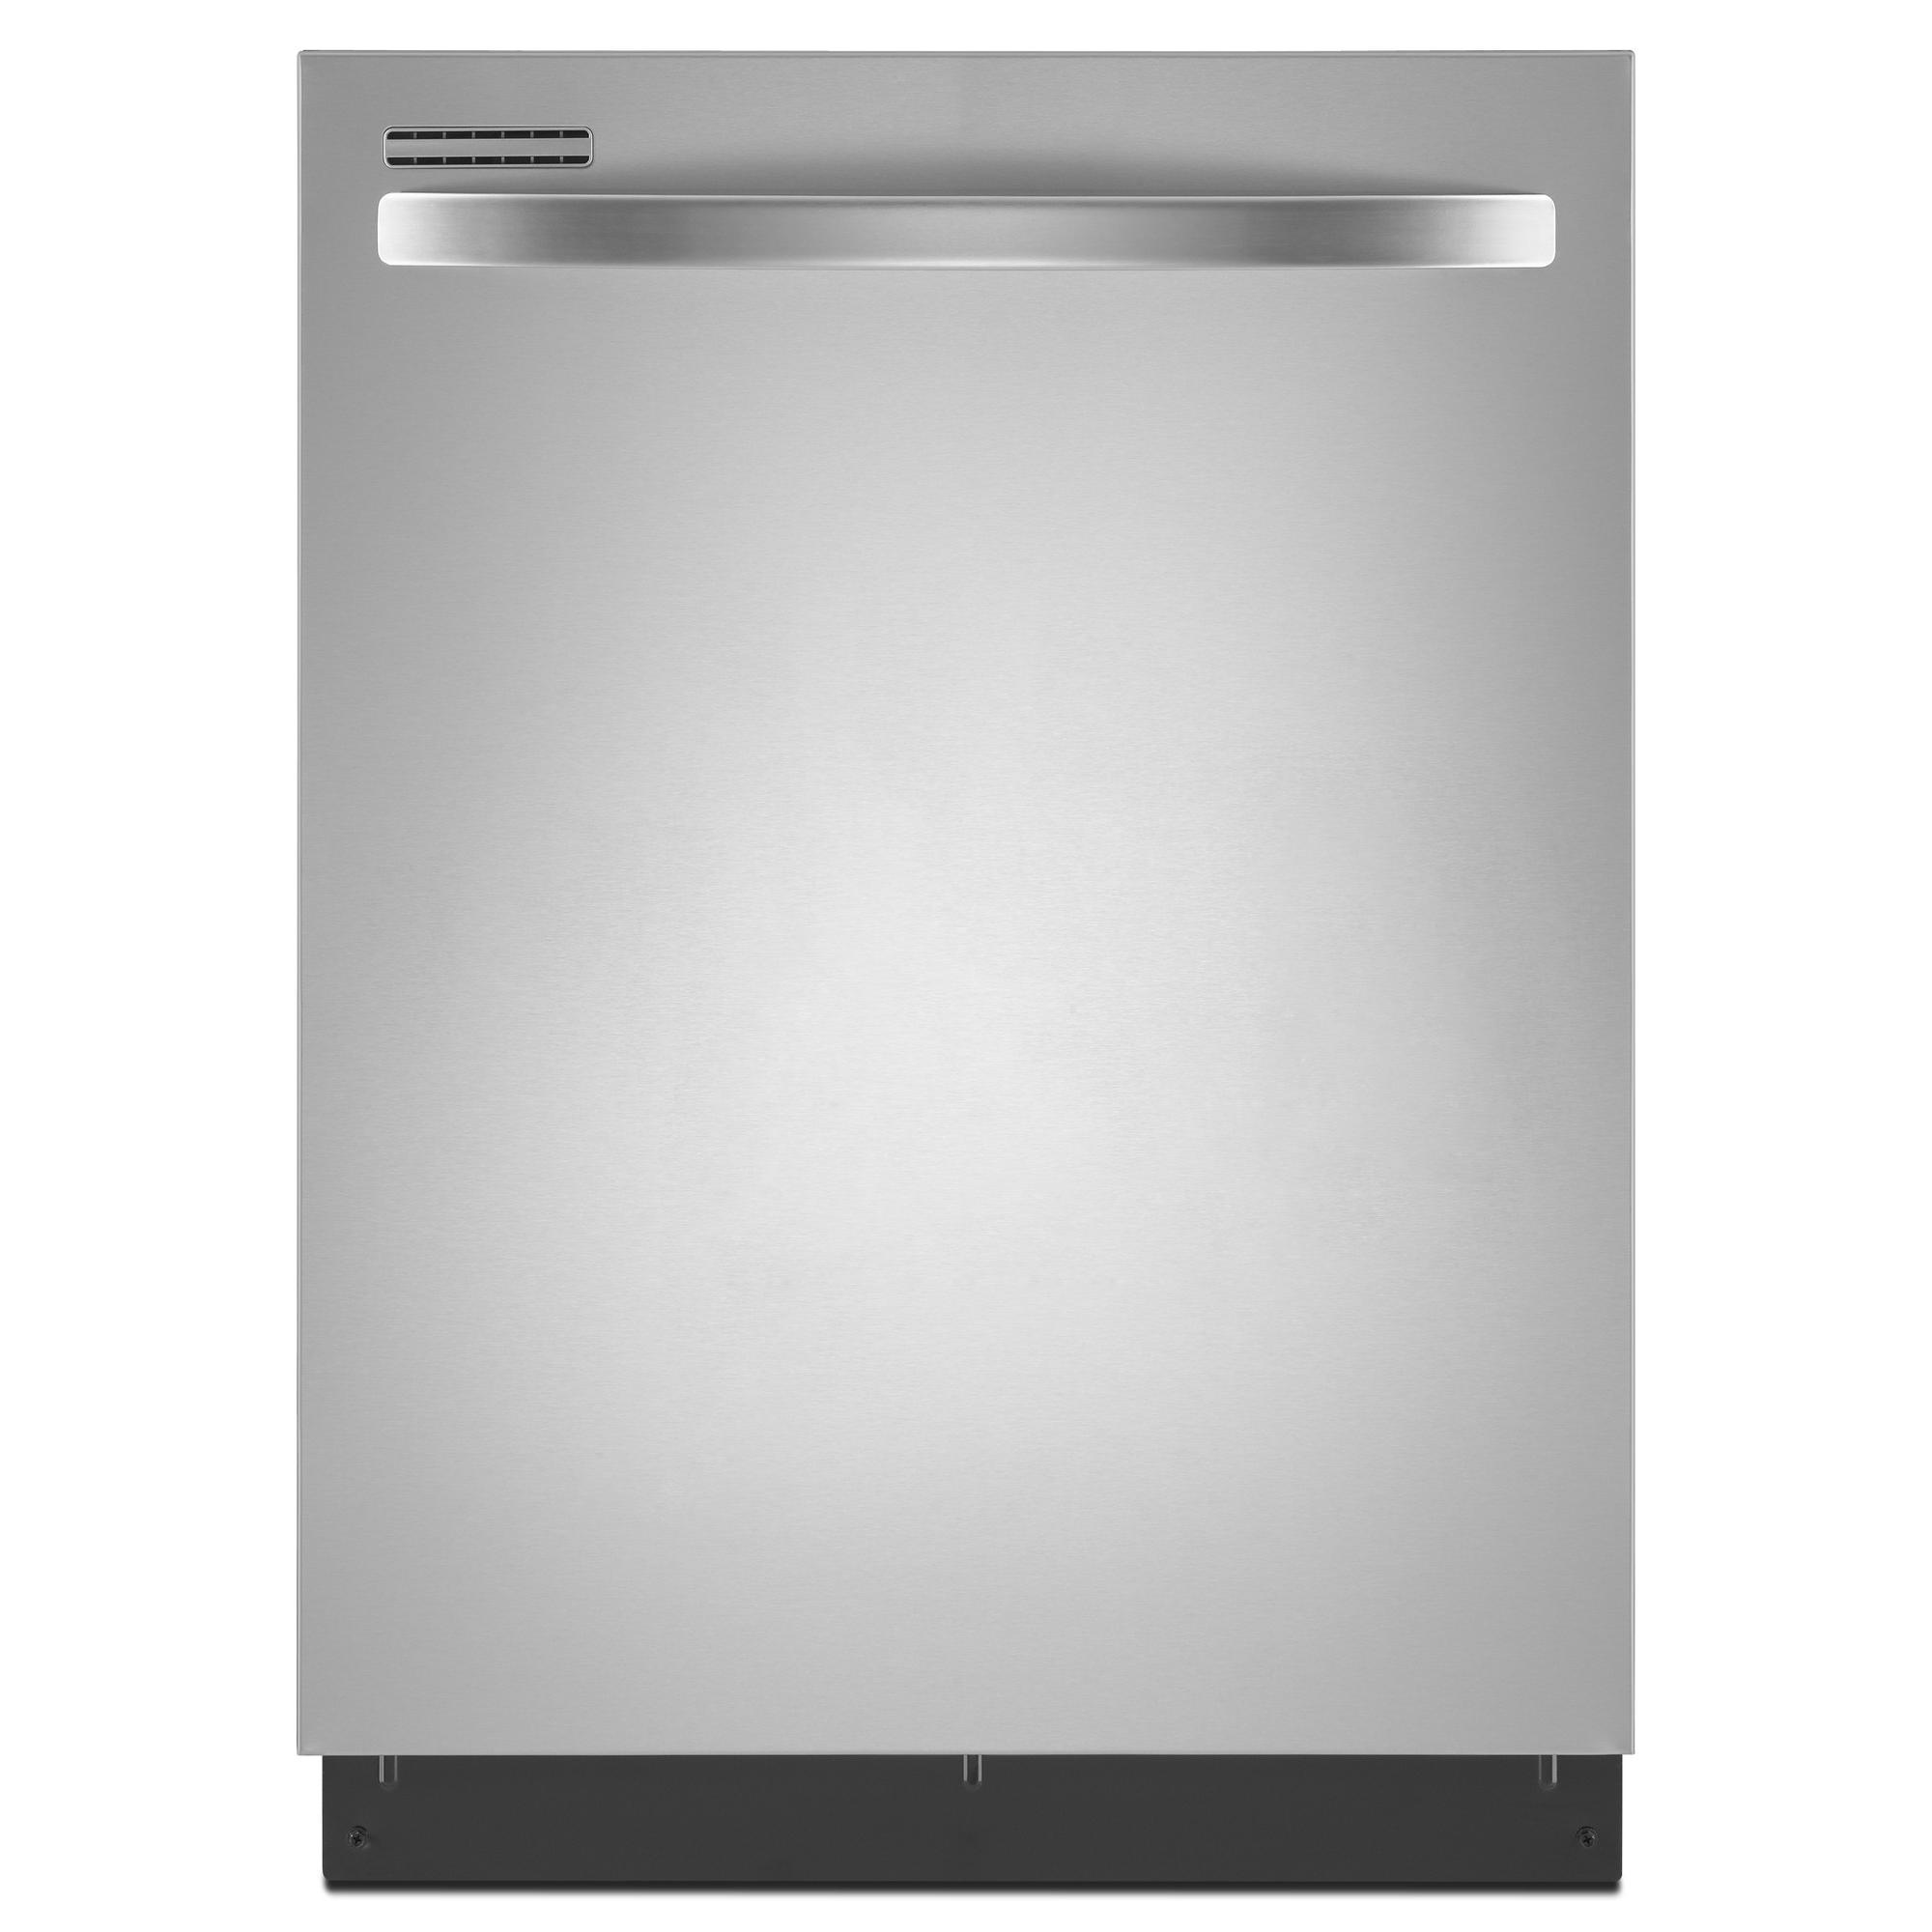 "Kenmore 12413 24"" Built-In Dishwasher w/ SmartWash® HE Cycle - Stainless Steel PartNumber: 02212413000P KsnValue: 8972238 MfgPartNumber: 12413"